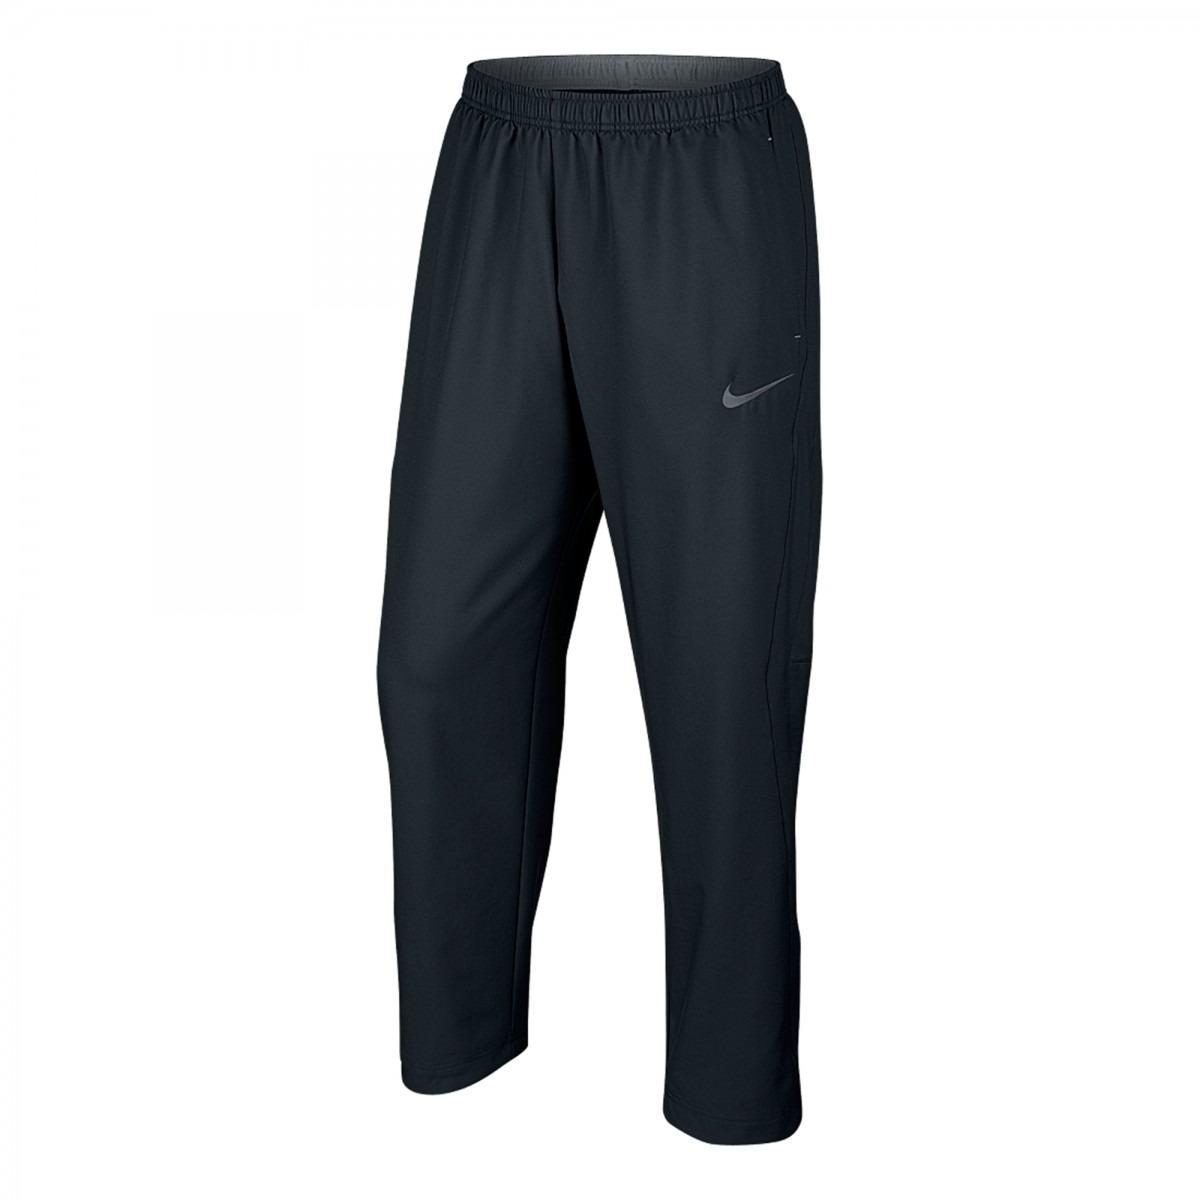 df98a42eb2 Calça Masculina Nike Dry Pant Team Woven 800201-010 - R  149